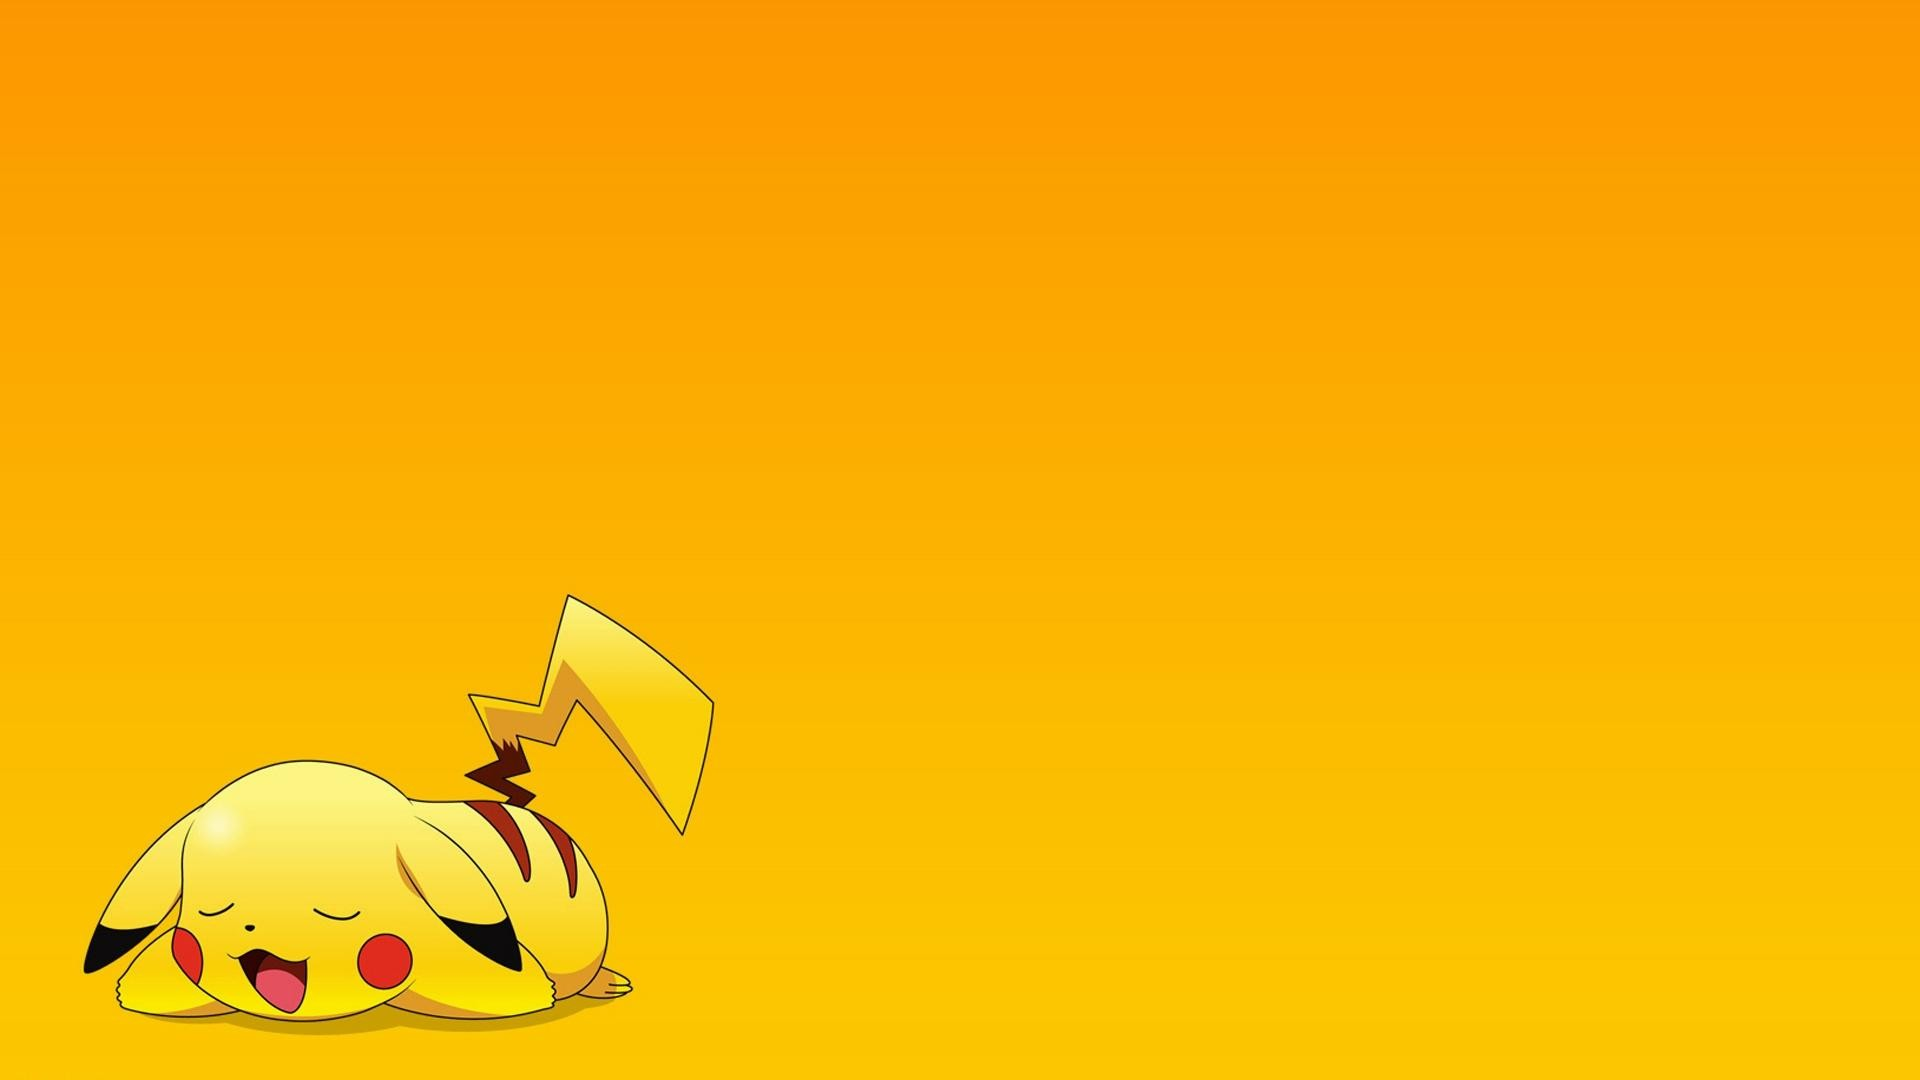 Wallpaper-HD-pikachu-free-download